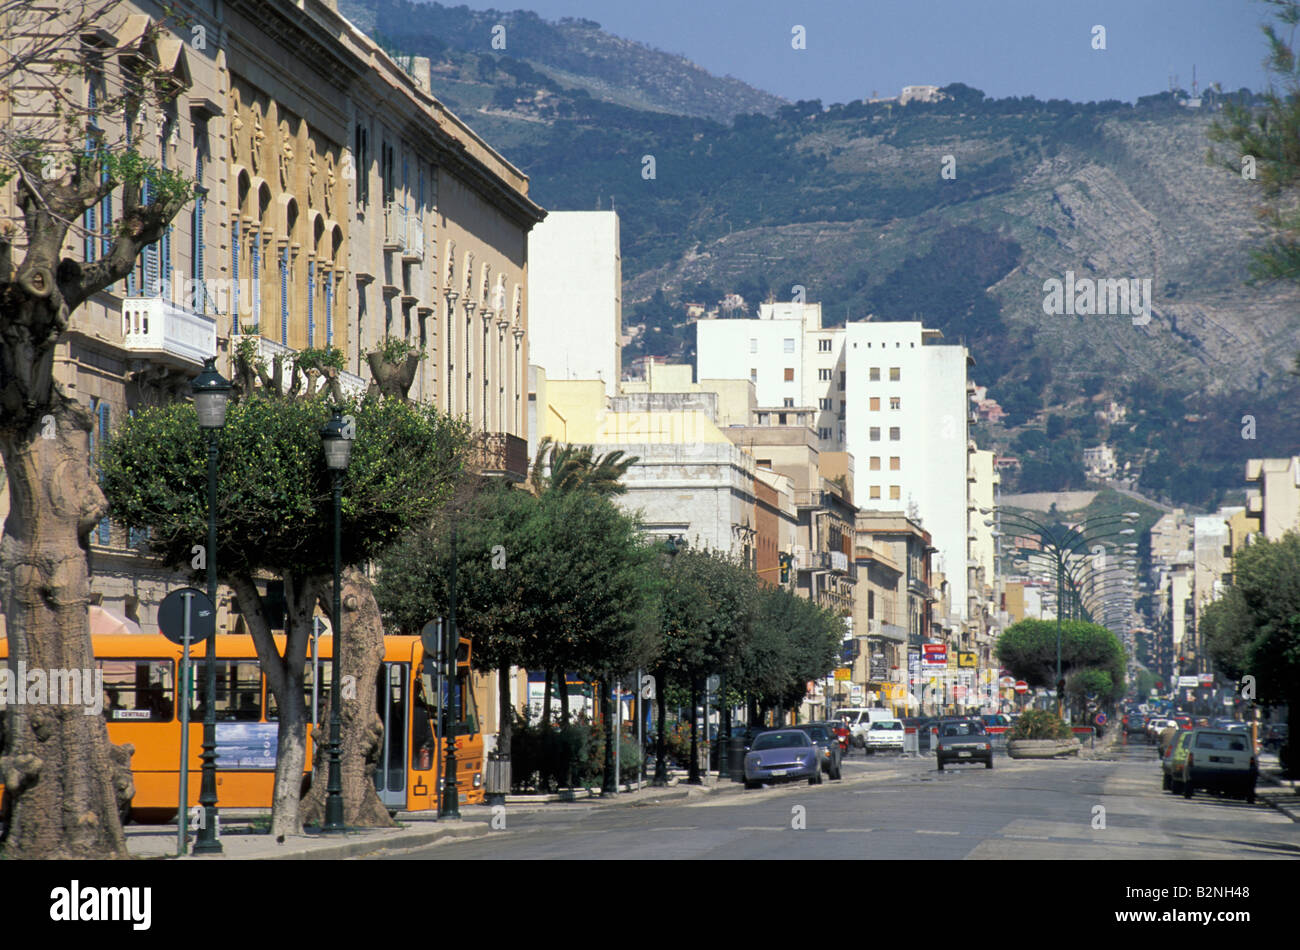 g. b. fardella street, trapani, Italy - Stock Image